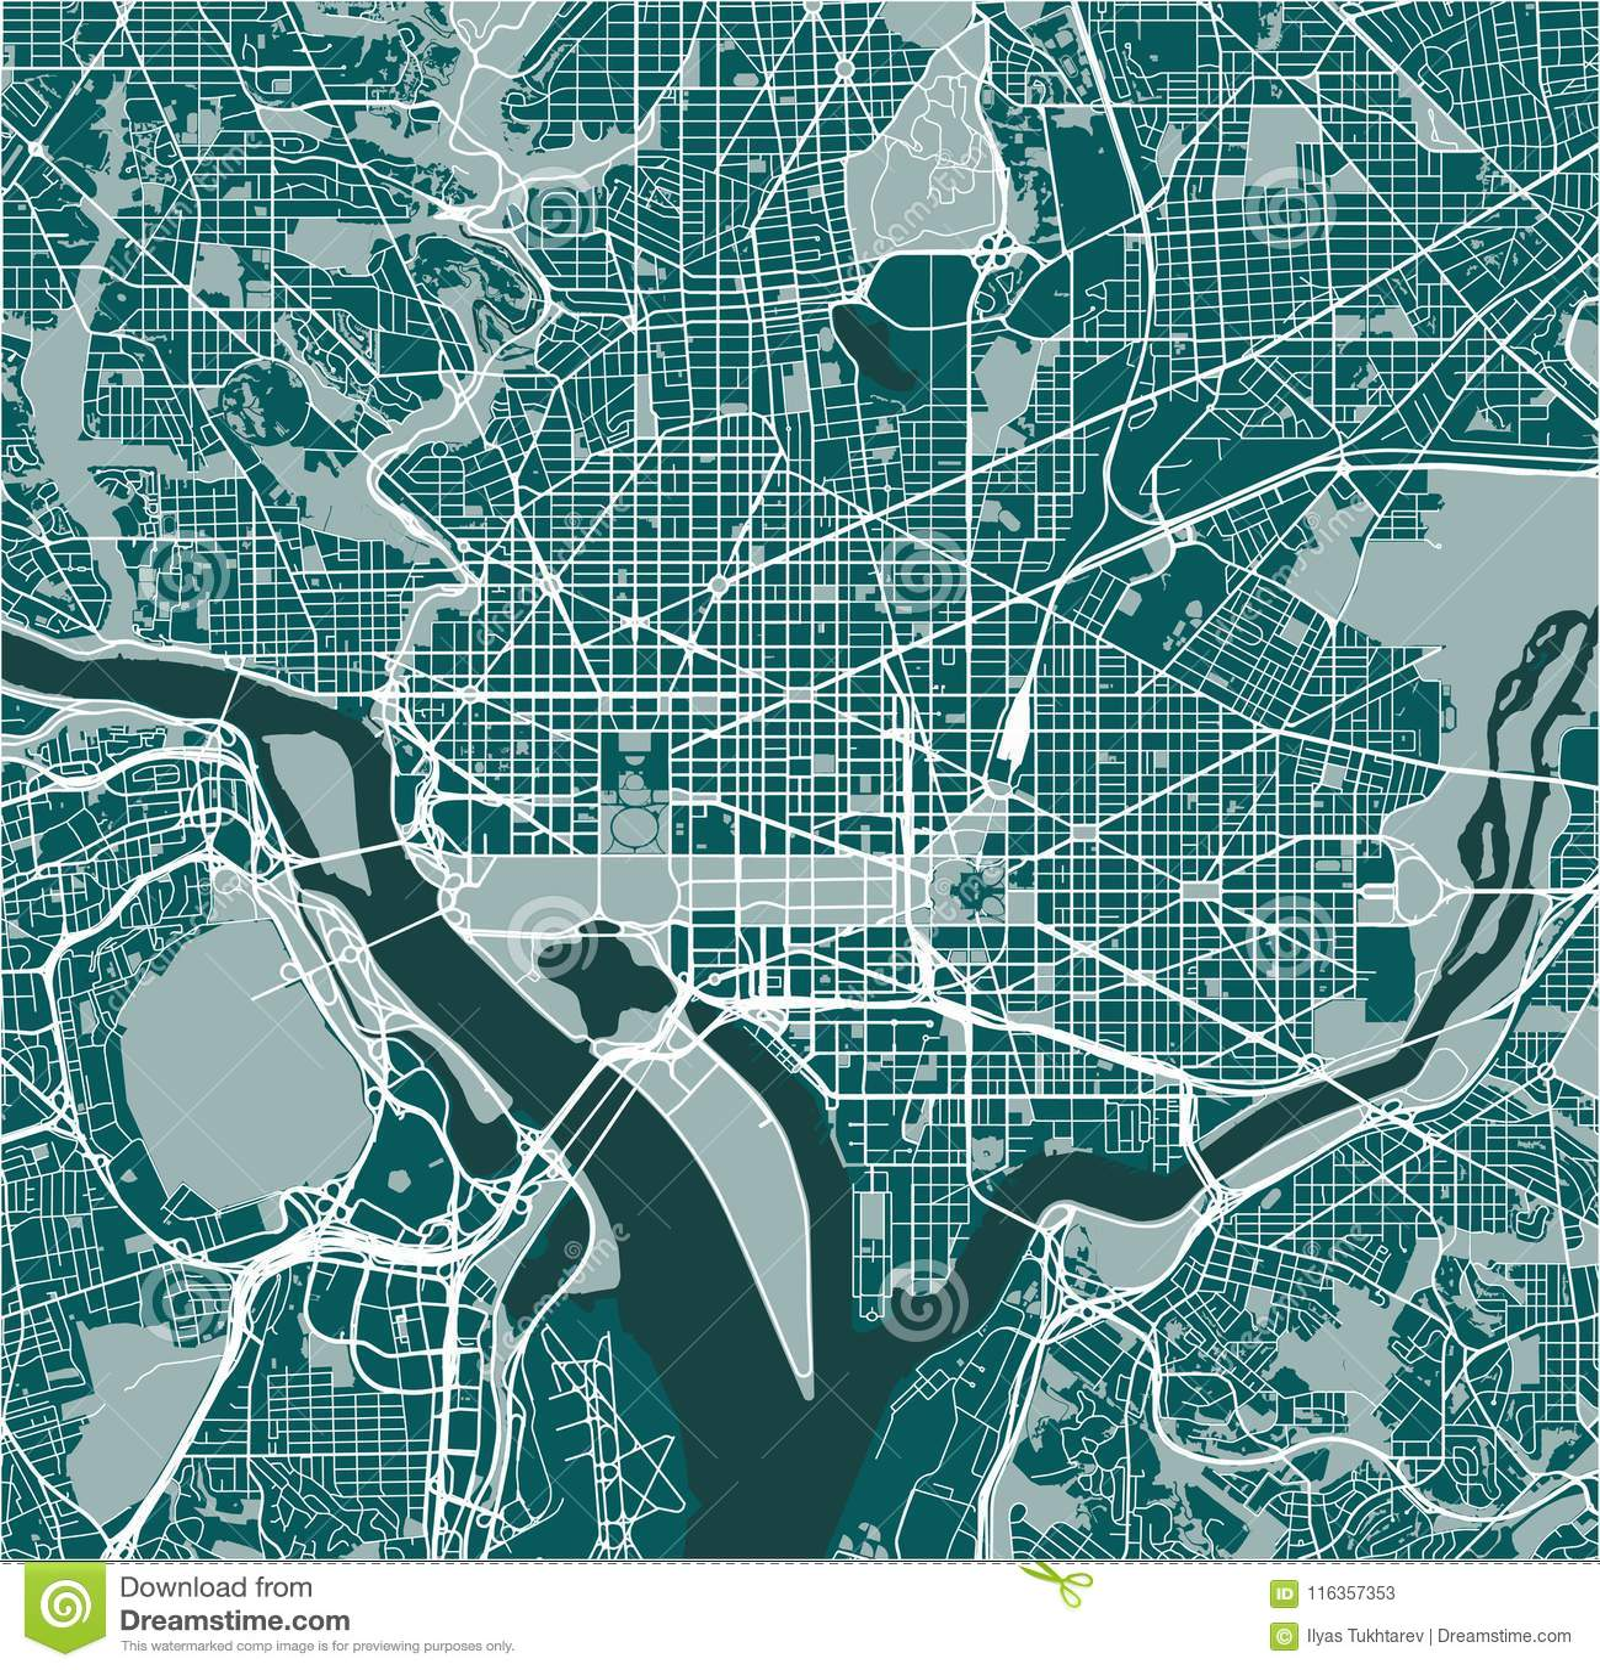 Map Of The City Of Washington, D.C., USA Stock Vector ...